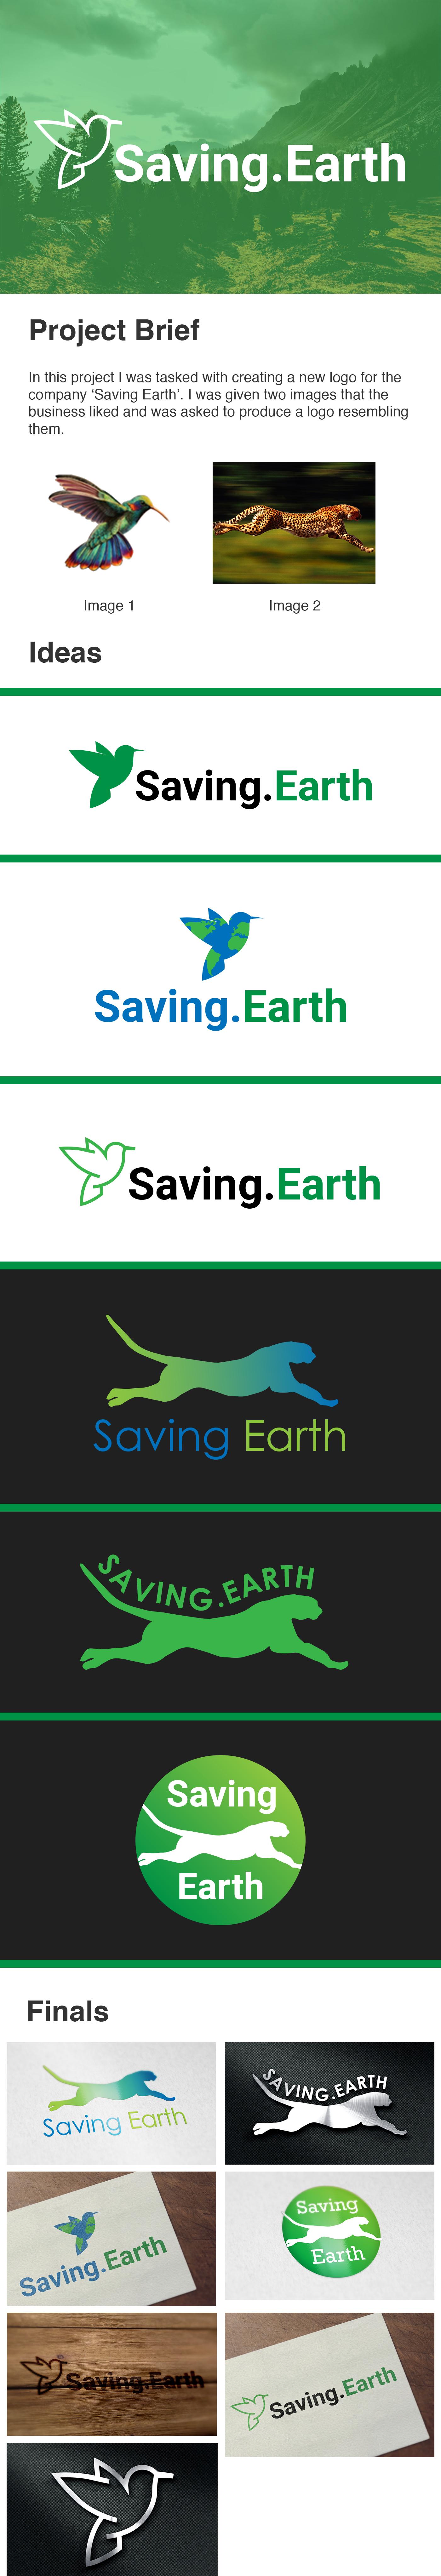 logo,design,animal,endangered,environment,climate,change,species,innovation,green